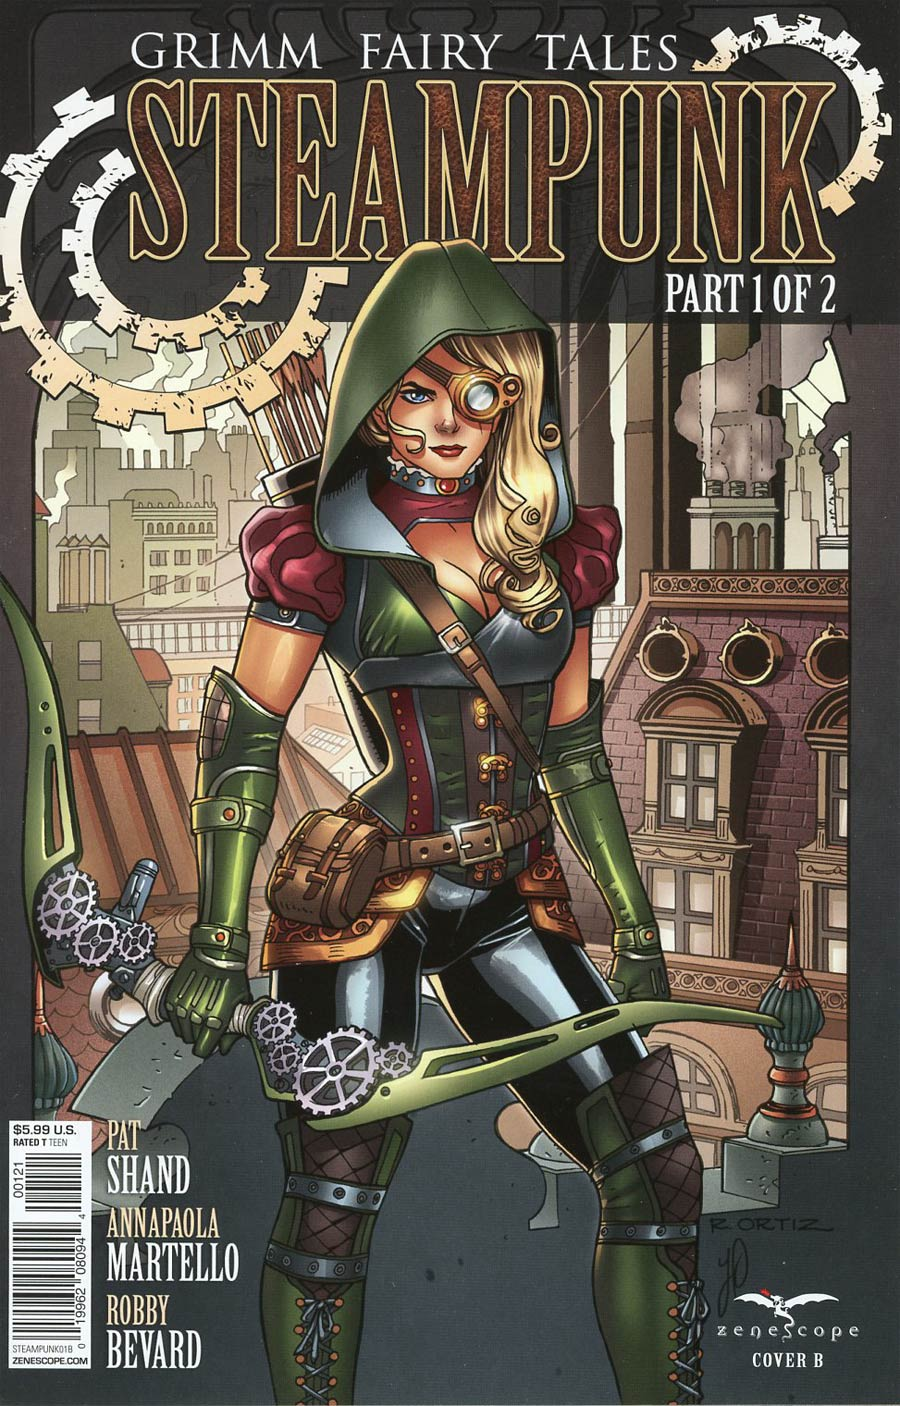 Grimm Fairy Tales Presents Steampunk #1 Cover B Richard Ortiz